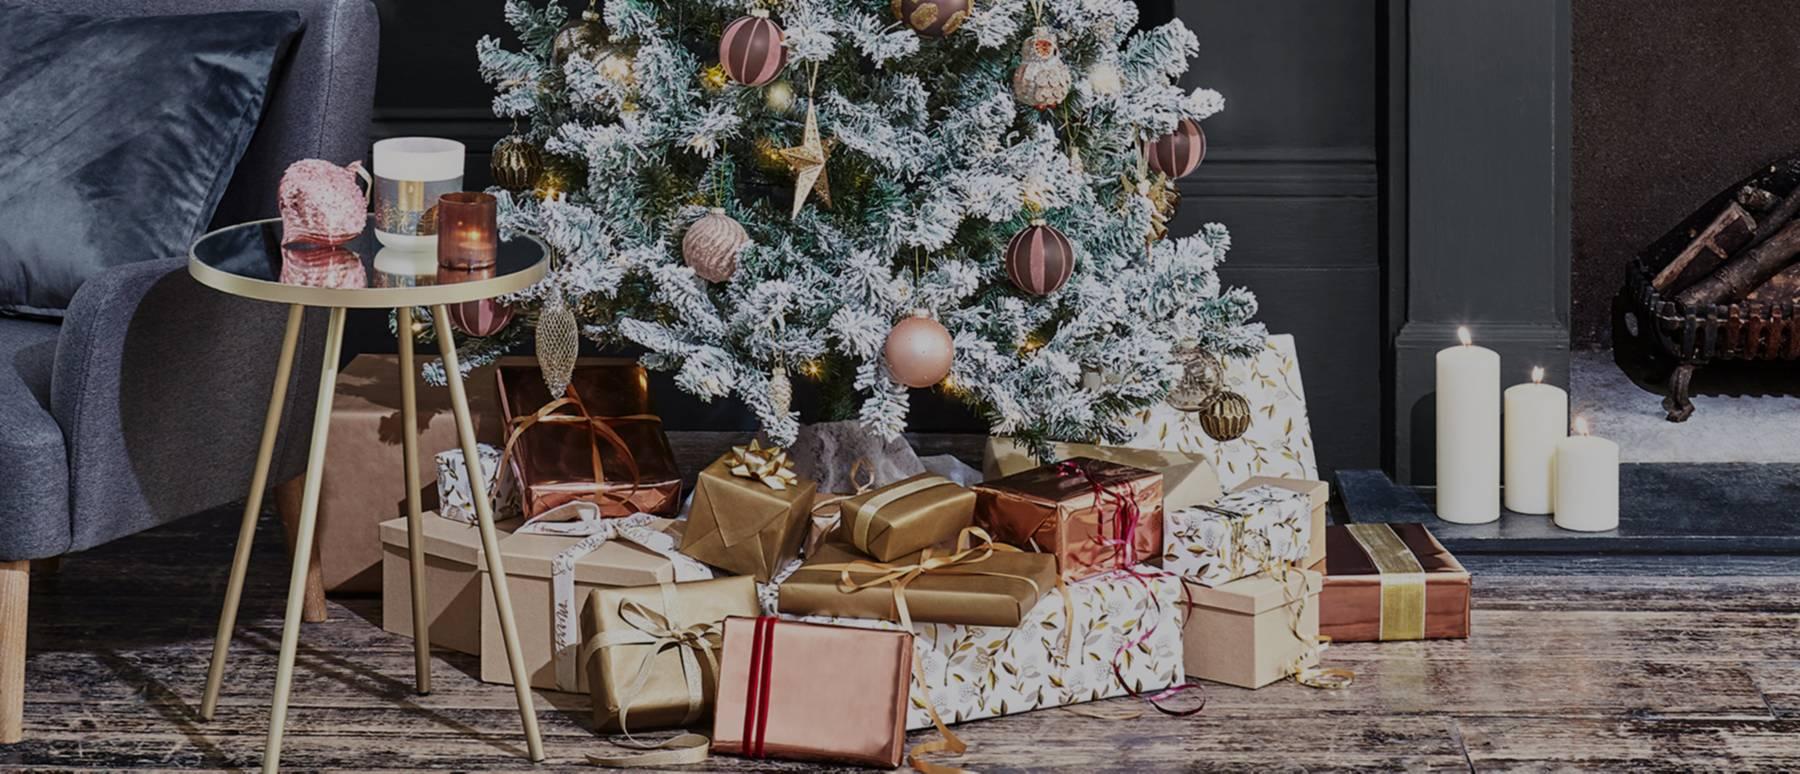 Christmas gifts, sorted